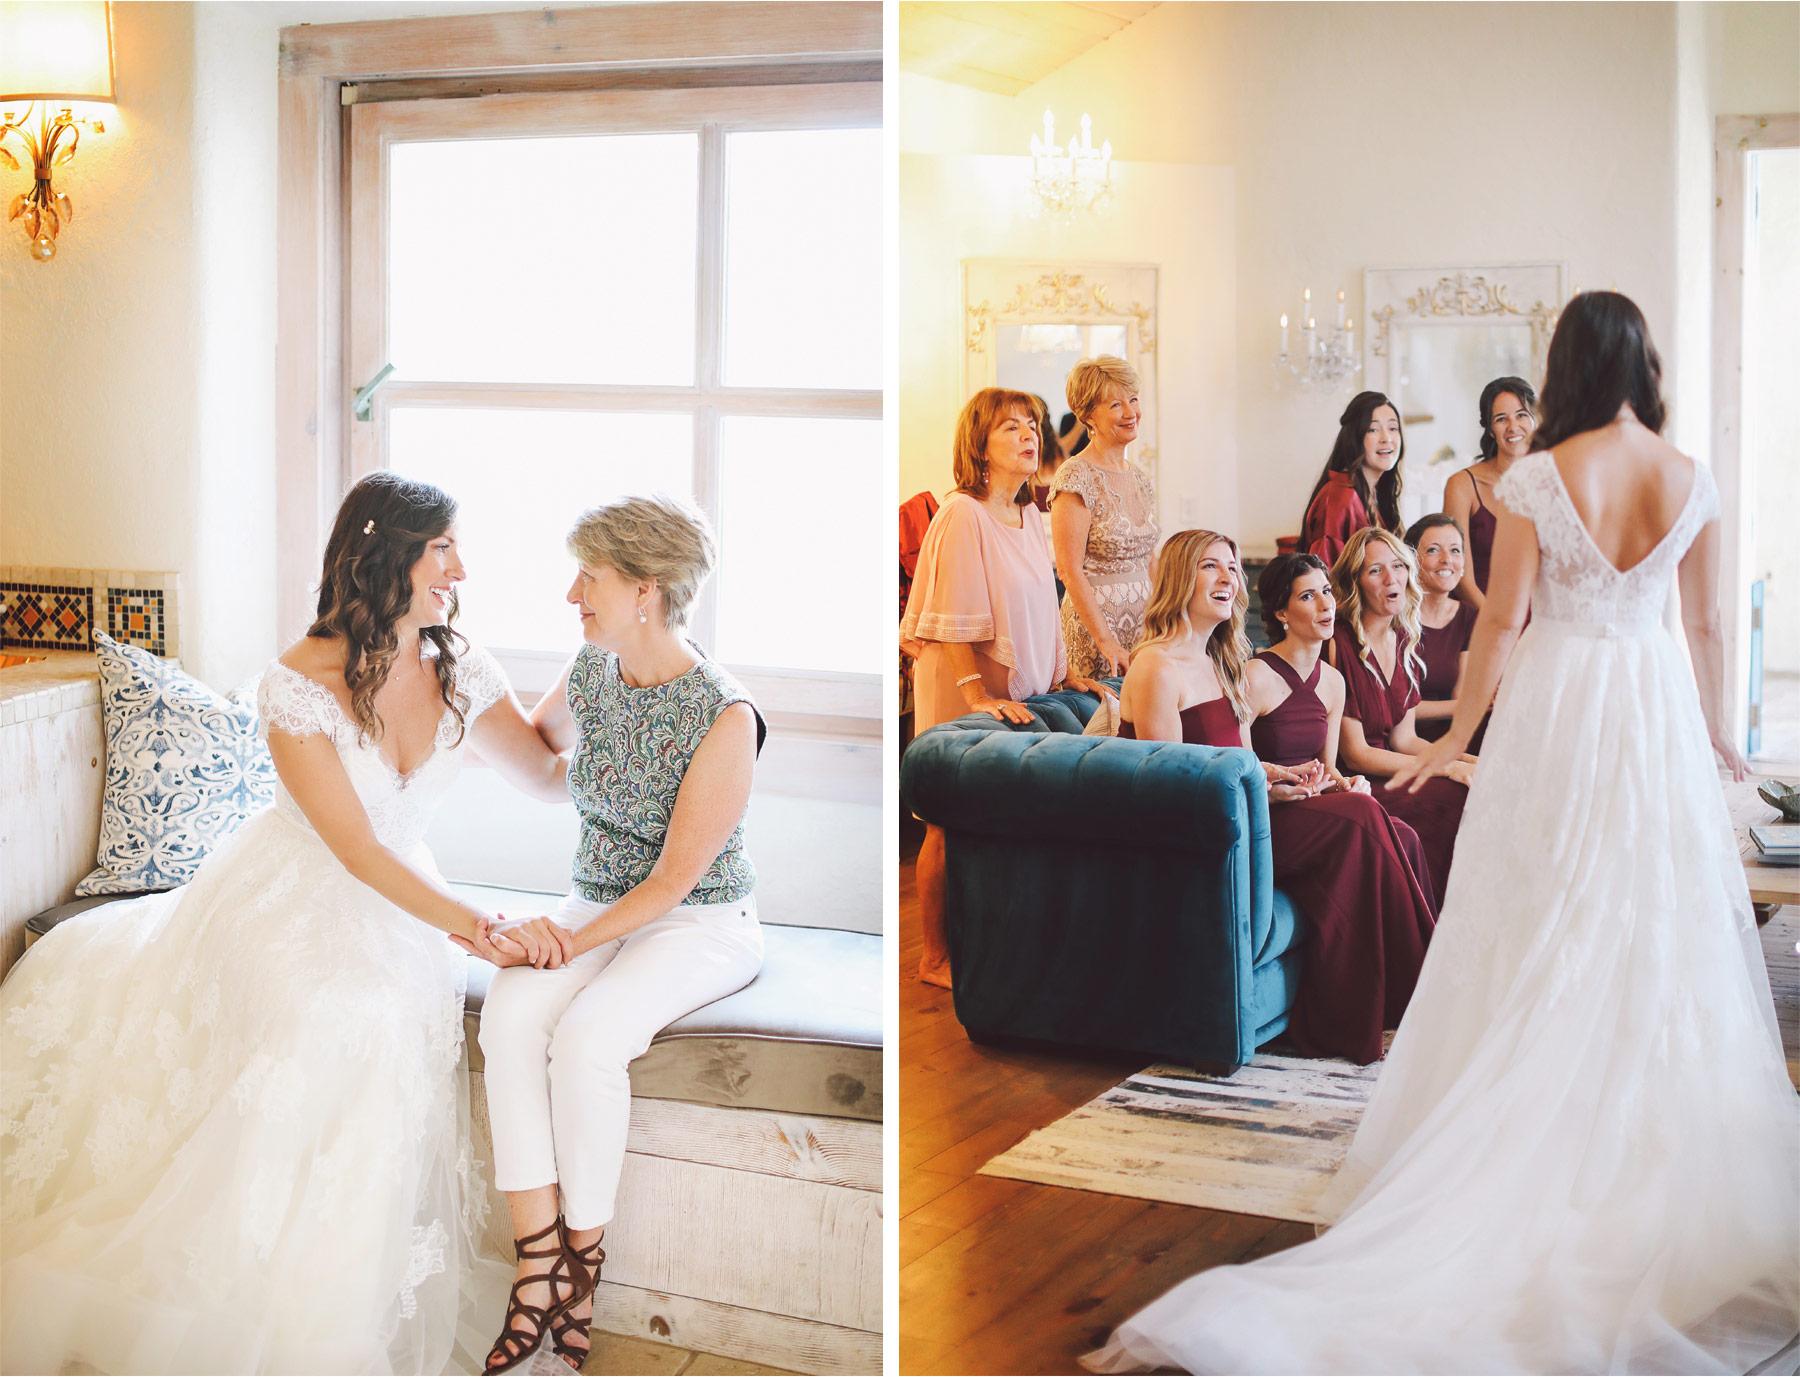 02-Weding-by-Vick-Photography-Minneapolis-Minnesota-Bavaria-Downs-Bride-Bridesmaids-Mother-Dress-Rebecca-and-Mark.jpg